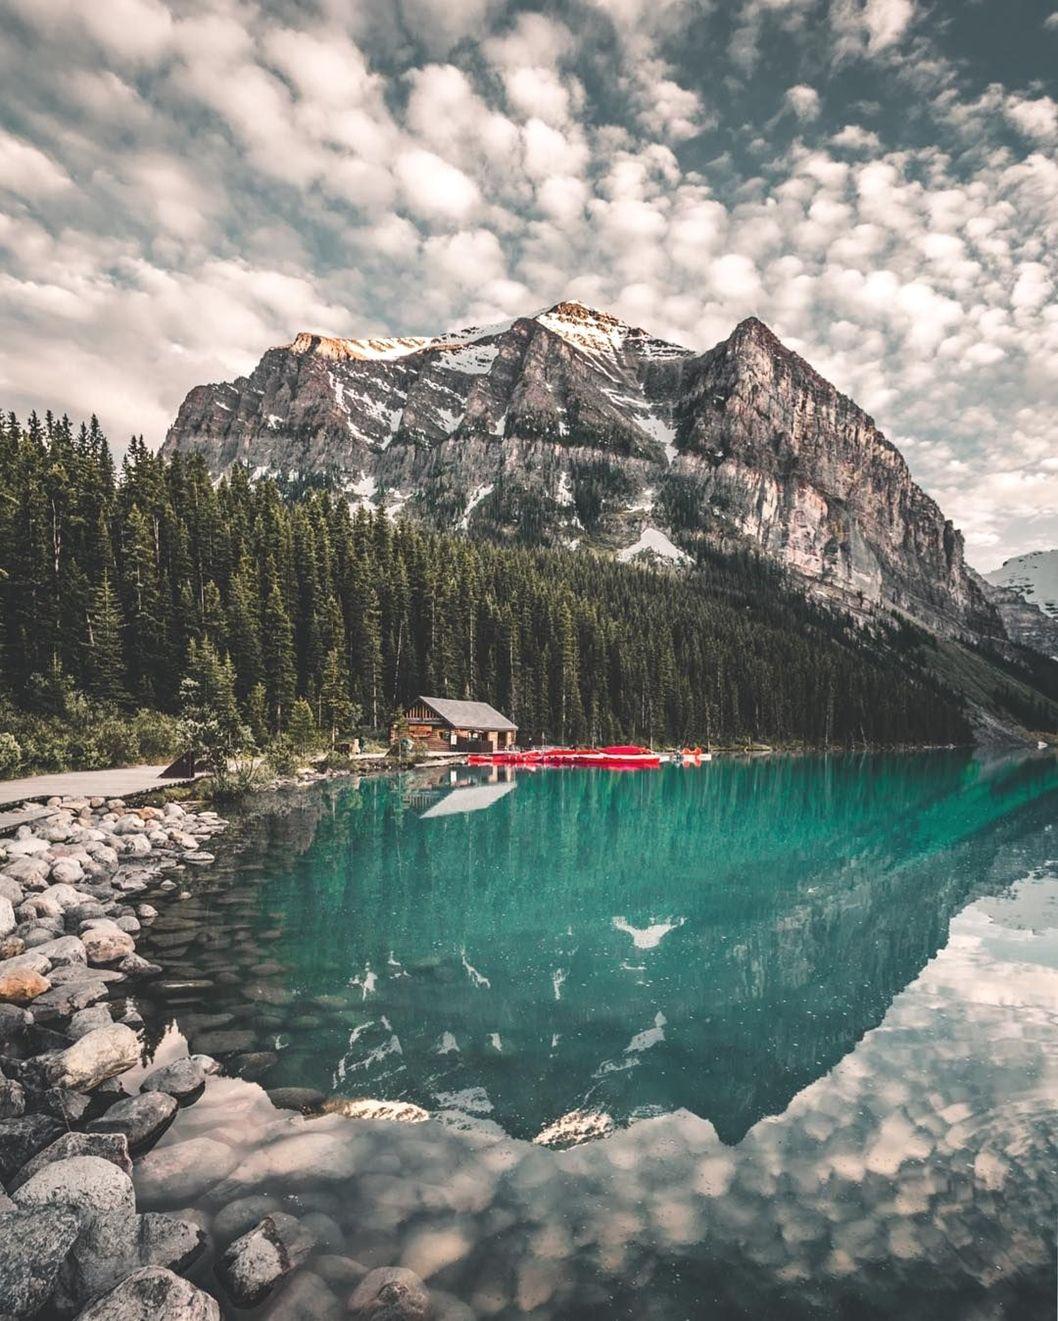 landscape photography jobs | Landscape photography